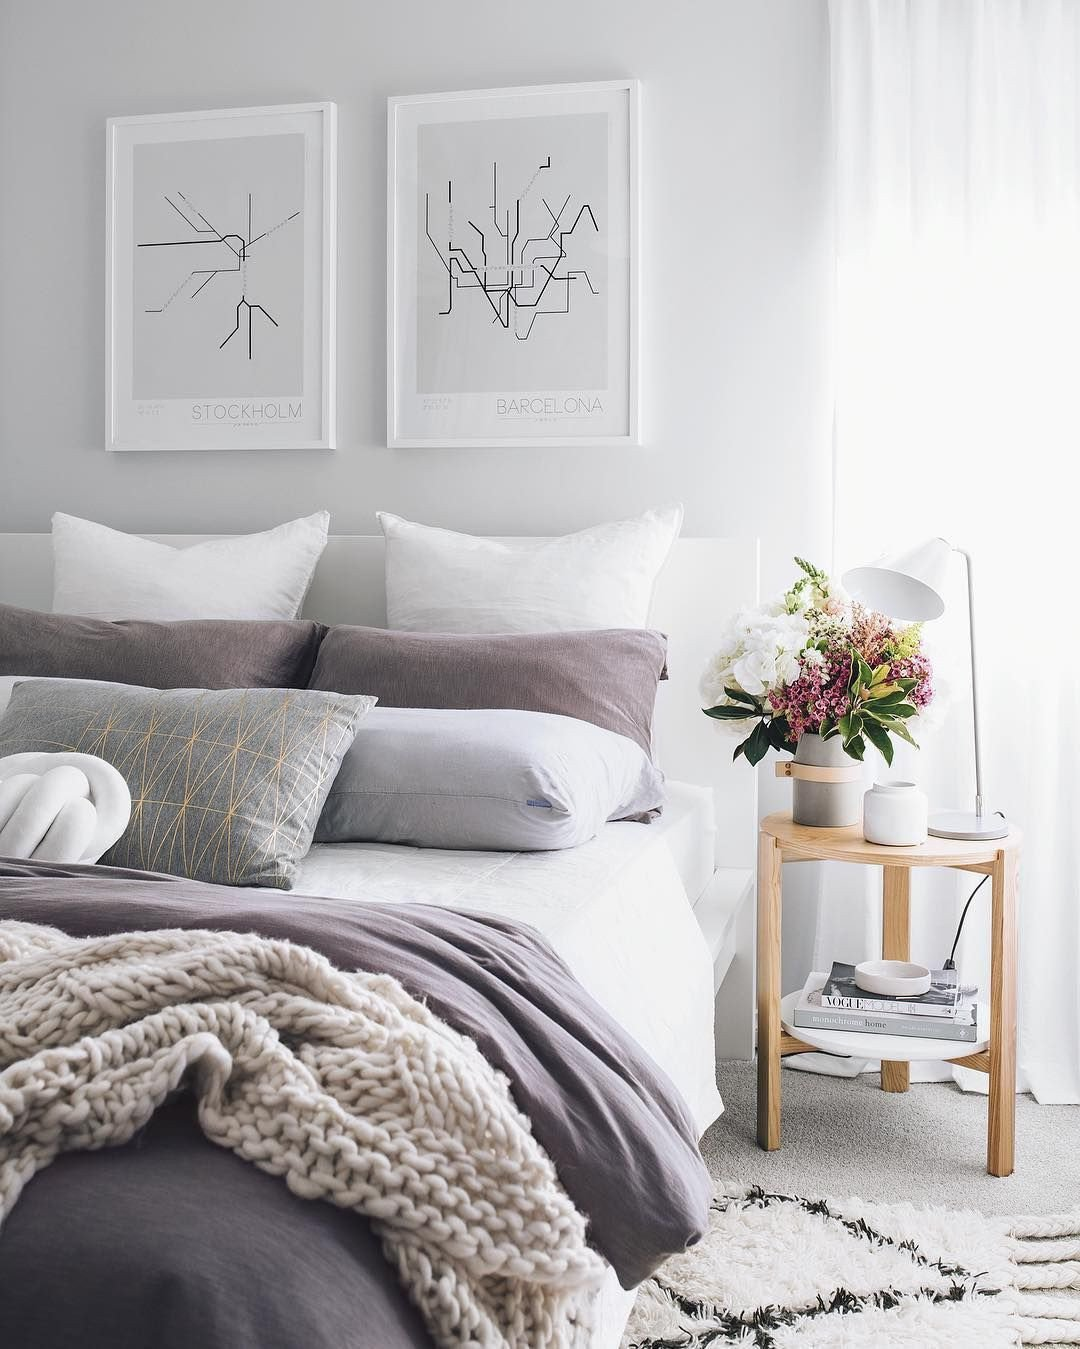 Gray and Gold Bedroom Inspirational 24 Grey and Gold Wall Art Kunuzmetals